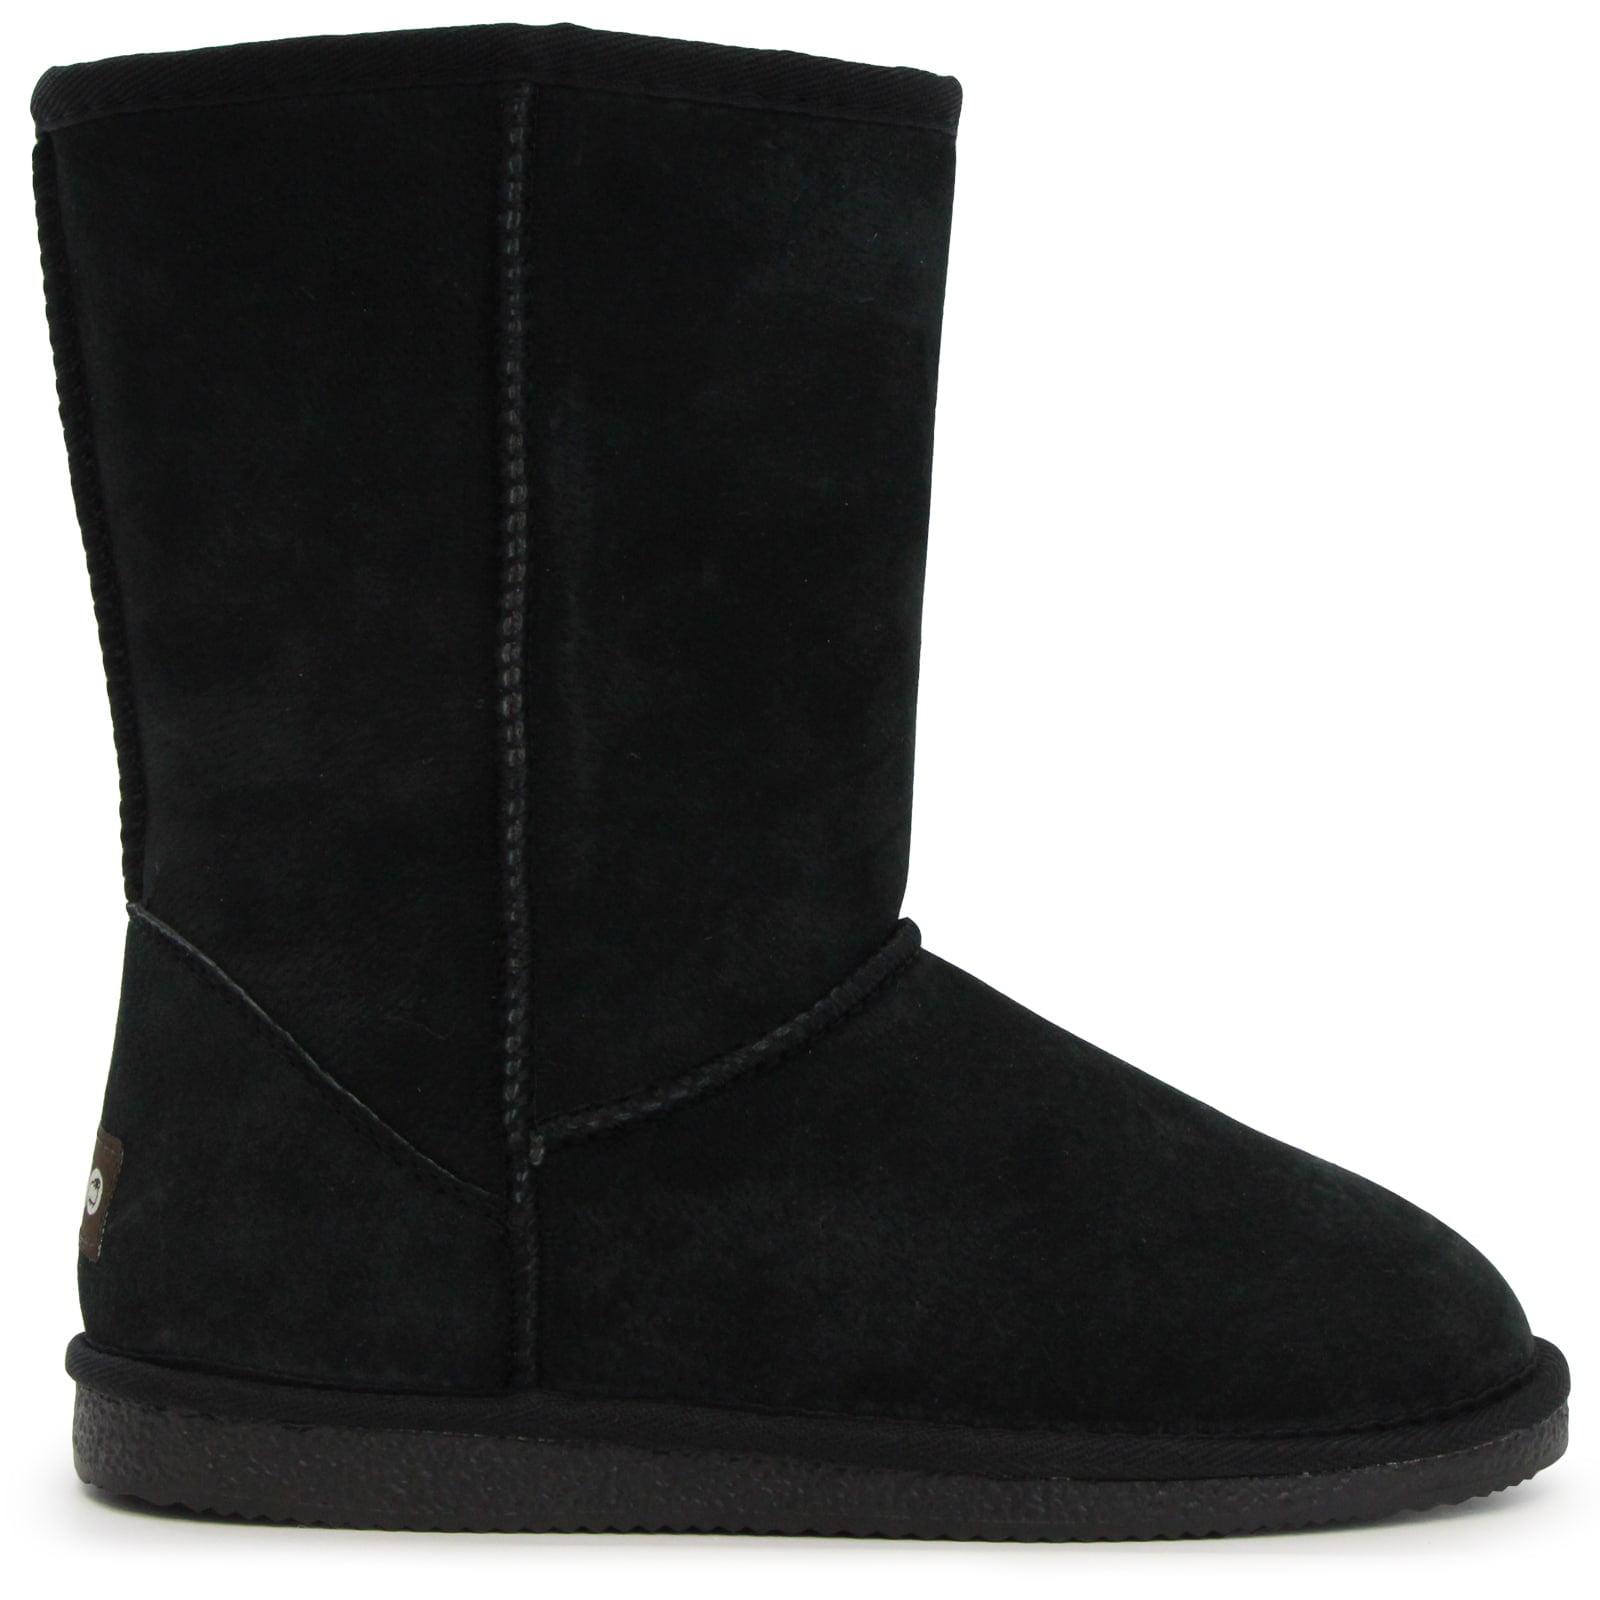 "Lamo 9"" Women's Faux Snow Sheepskin Shearling Boots Suede Size 5 by Overstock"